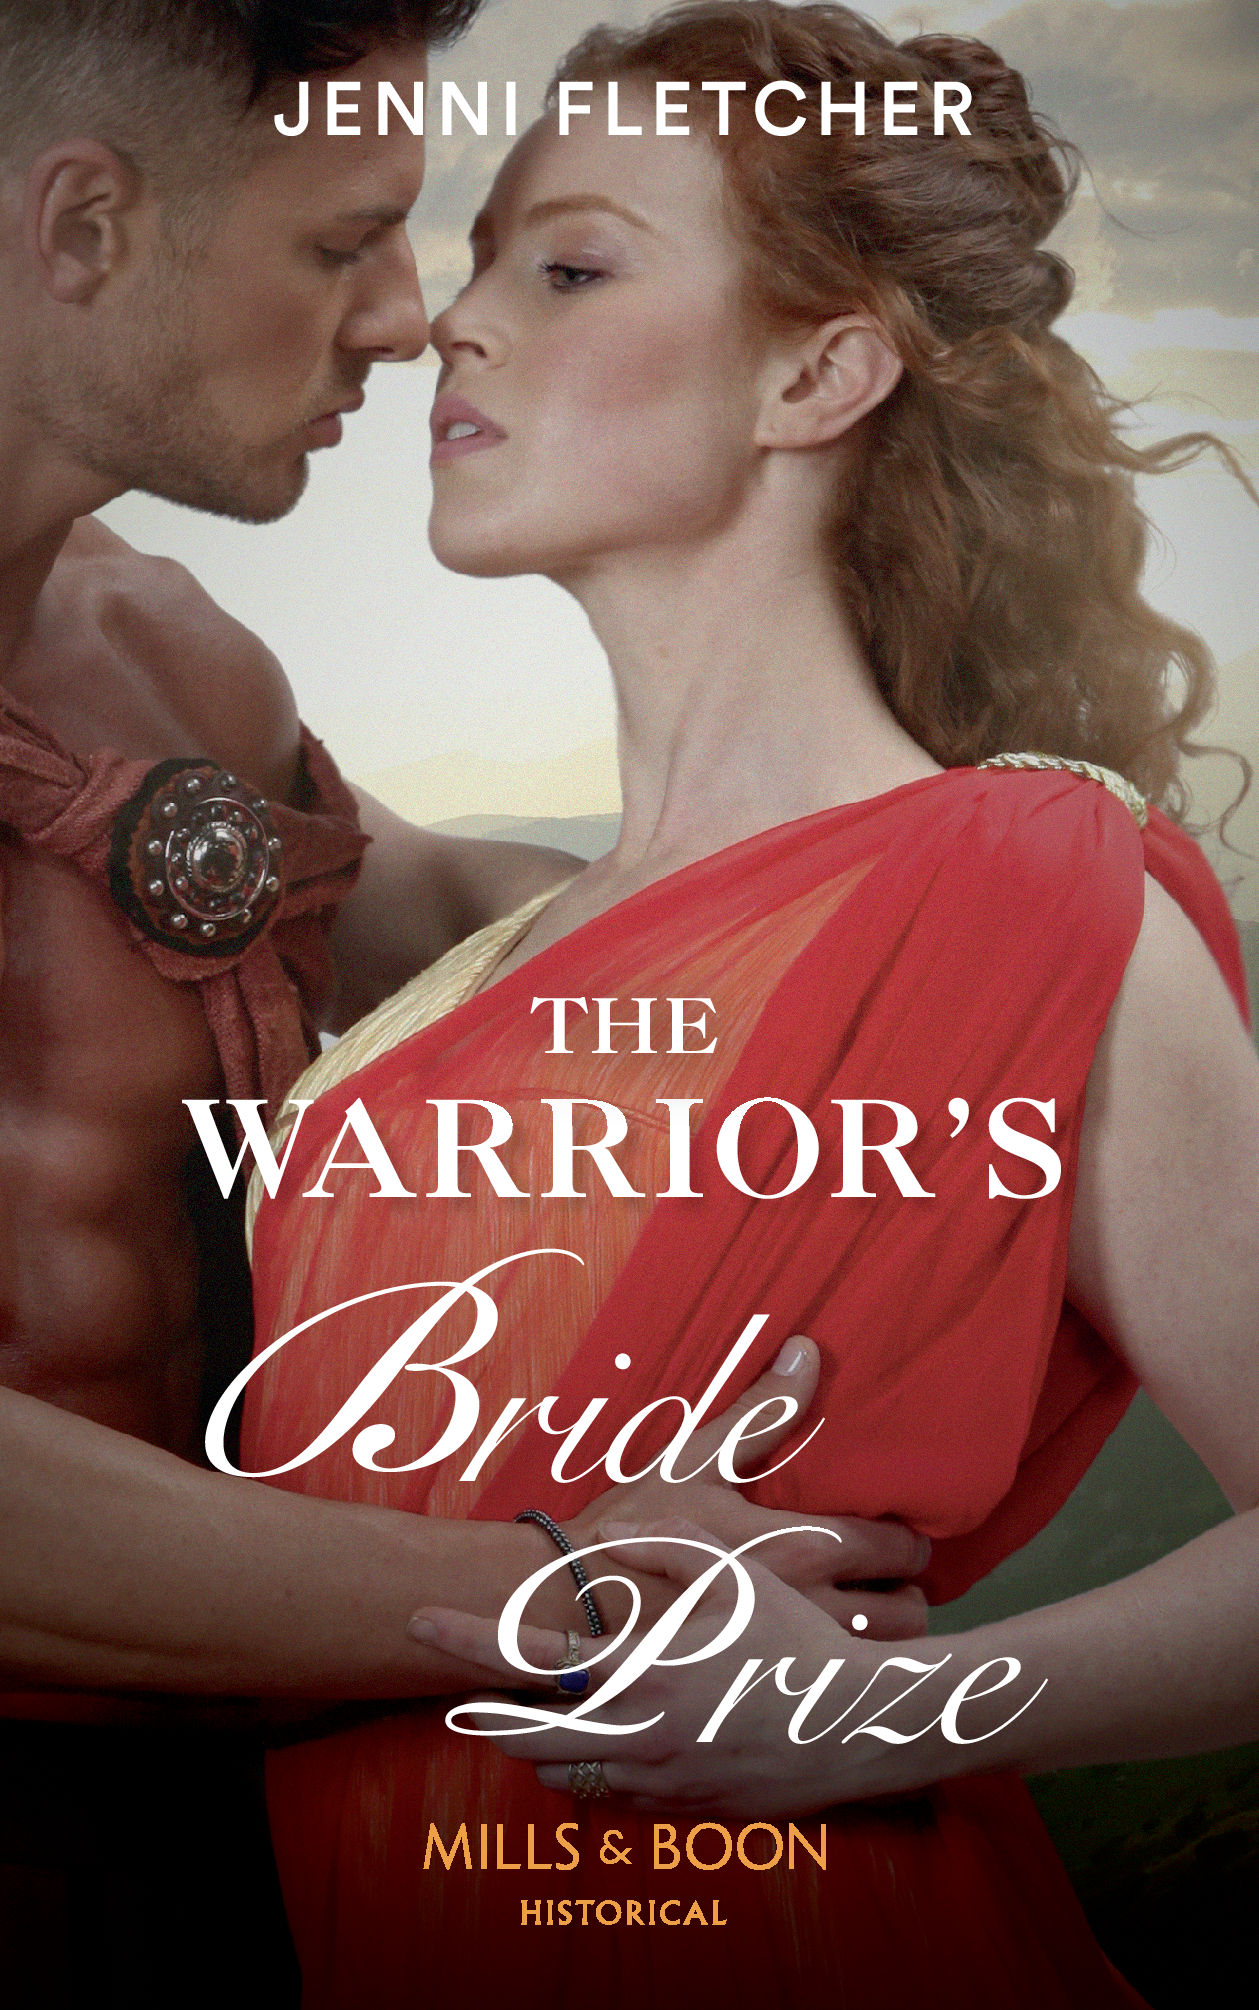 Book-Review-Warrior-Bridge-Prize-Jenni-Fletcher-Cover